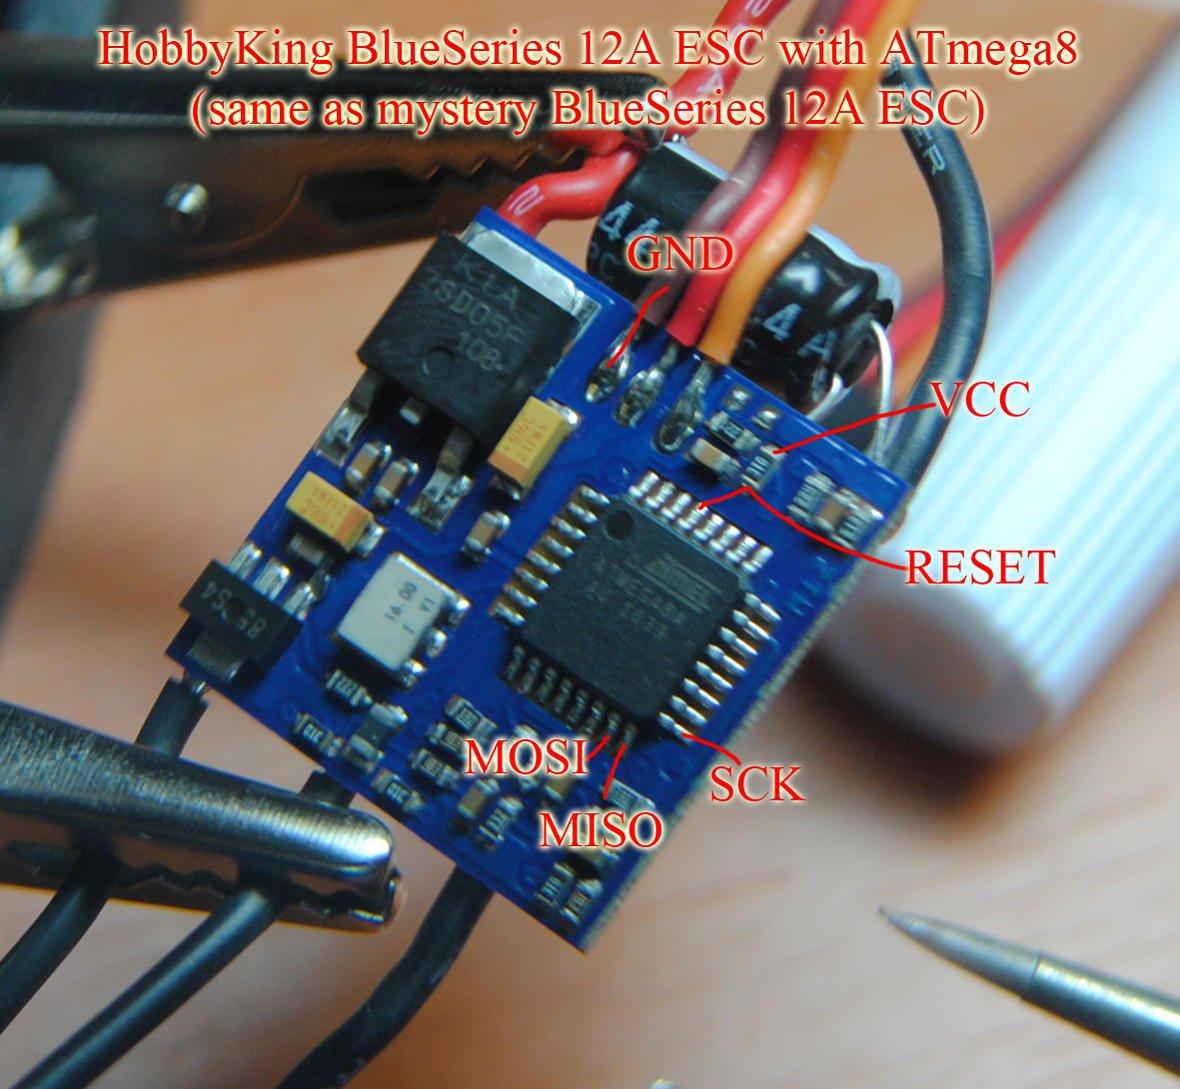 Mystery Esc Wiring Diagram - Atv Wiring Connectors -  dvi-d.nescafe.jeanjaures37.fr | Mystery Esc Wiring Diagram |  | Wiring Diagram Resource